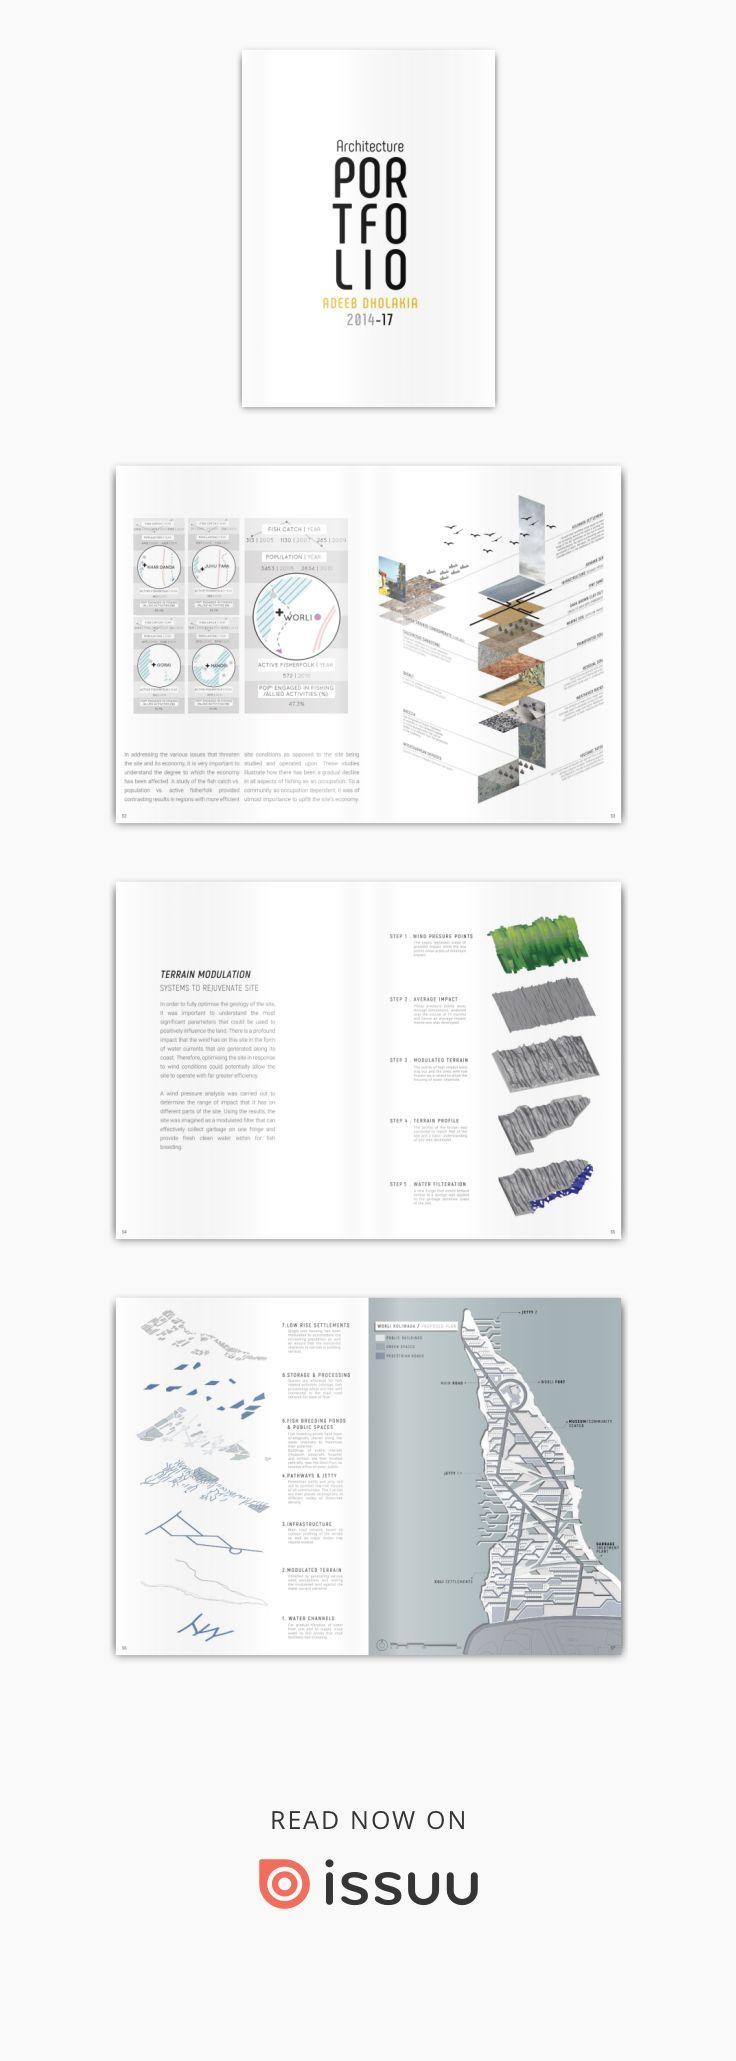 Adeeb Dholakia - Undergraduate Architecture Portfolio  Selected works (2014-2017) completed while pursuing architecture at Balwant Sheth School of Architecture (NMIMS, Mumbai)